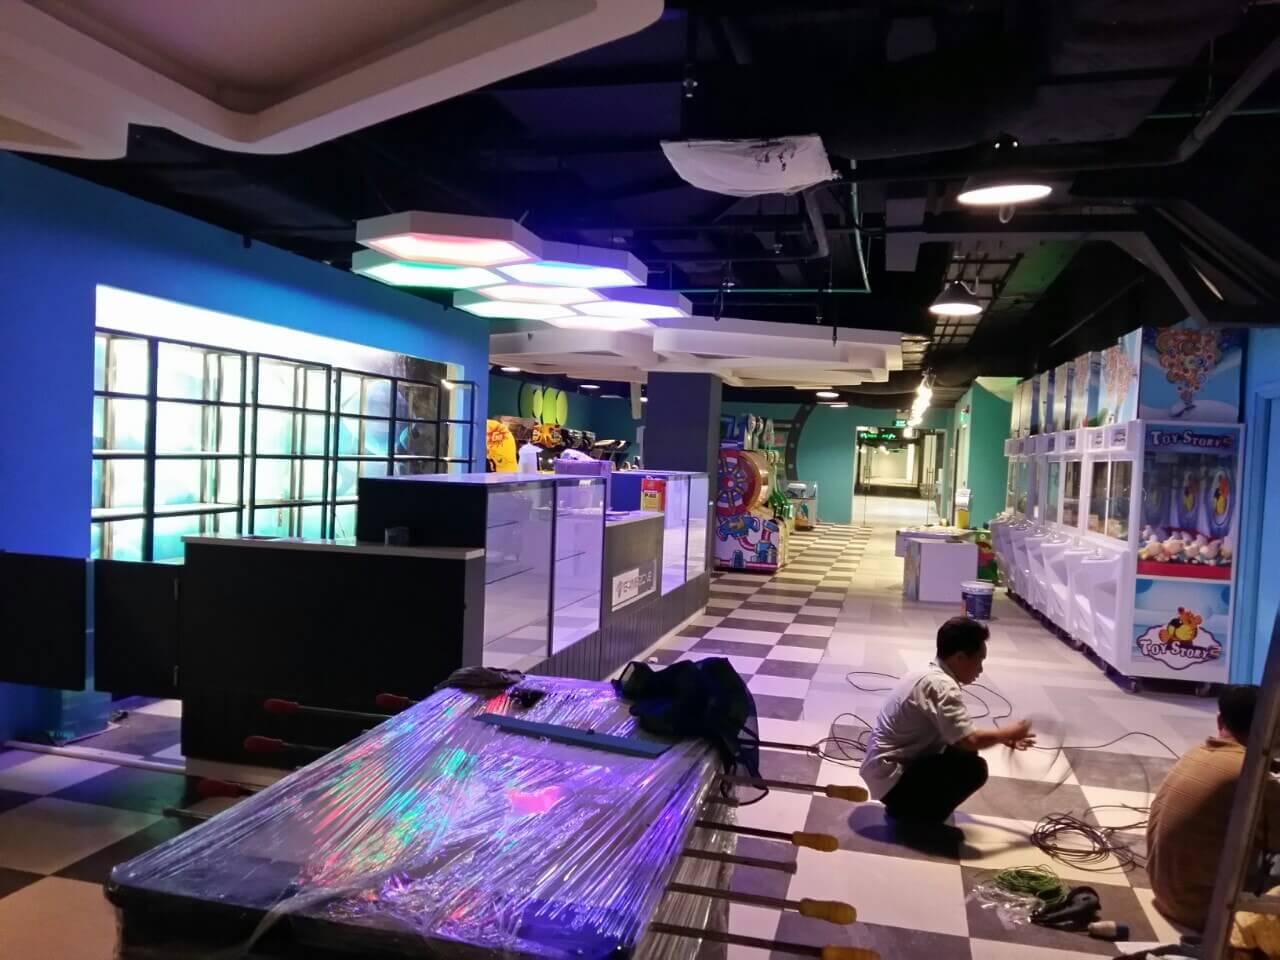 GOADESIGN Thiết Kế Khu Vui Chơi Garden Mall - Q5 (20)